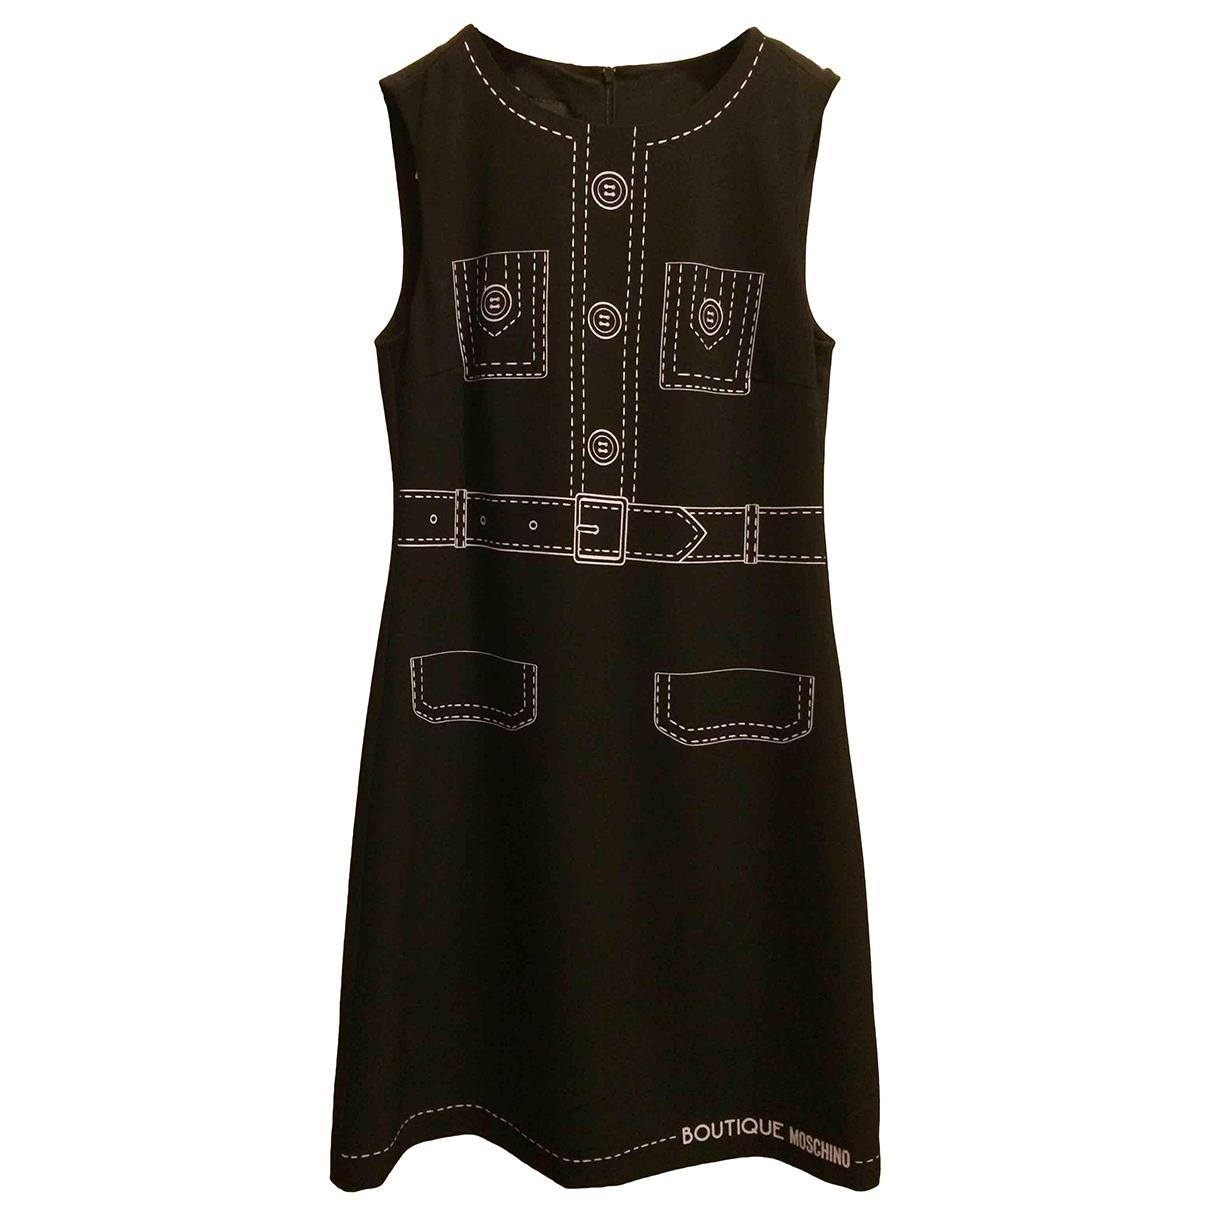 Moschino \N Black dress for Women 38 IT